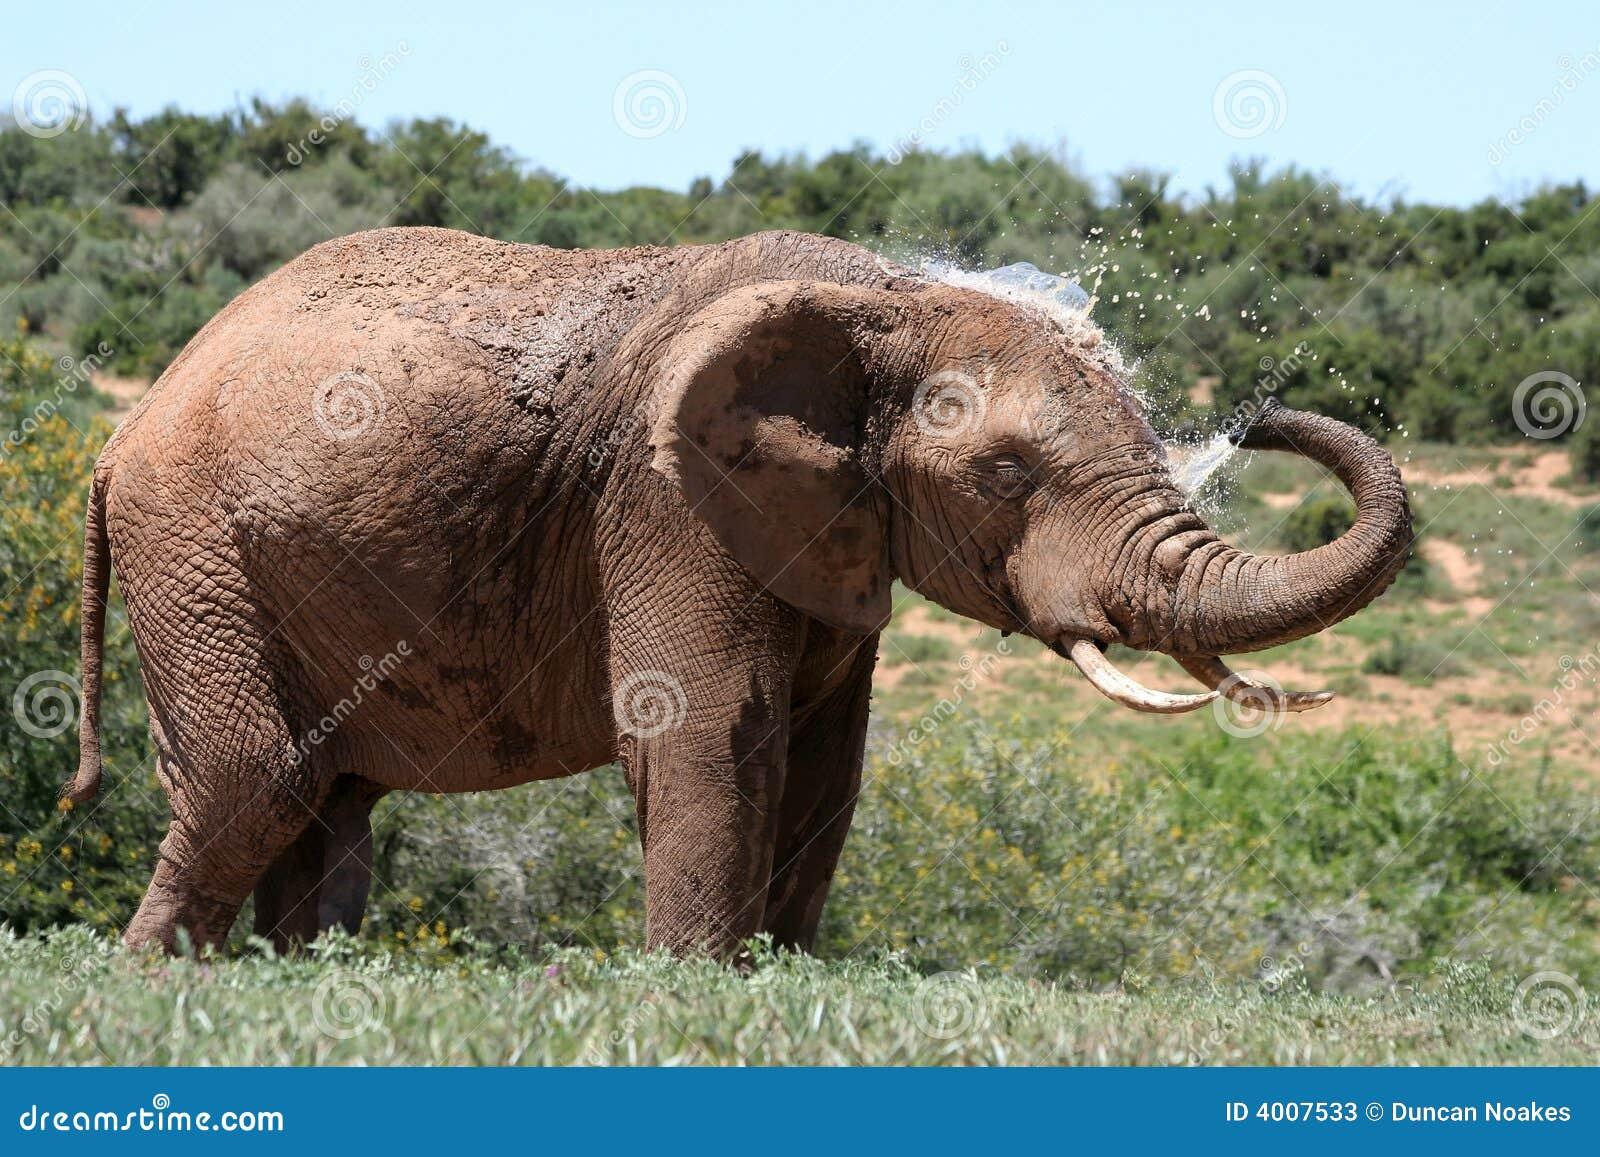 Elephant spraying water - photo#15